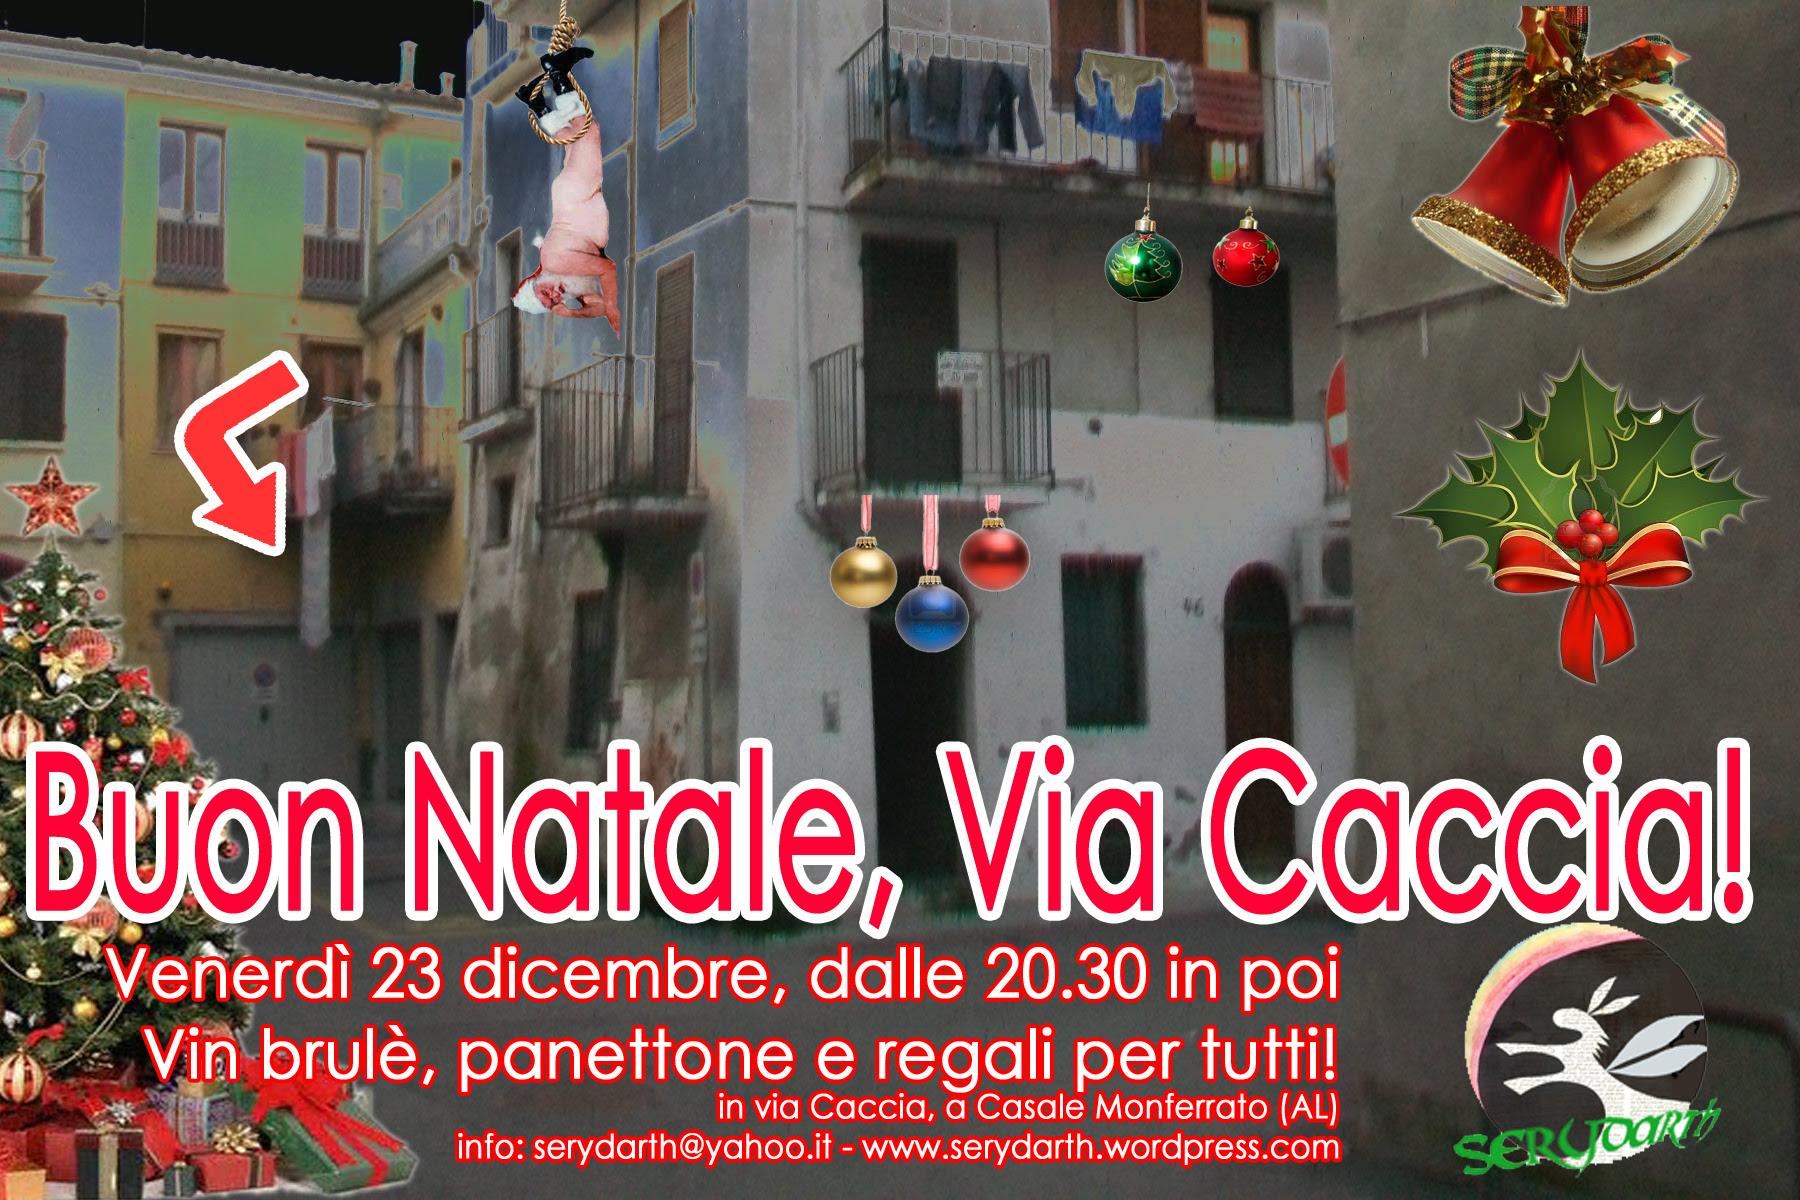 http://serydarth.files.wordpress.com/2011/12/buon-natale-via-caccia.jpg